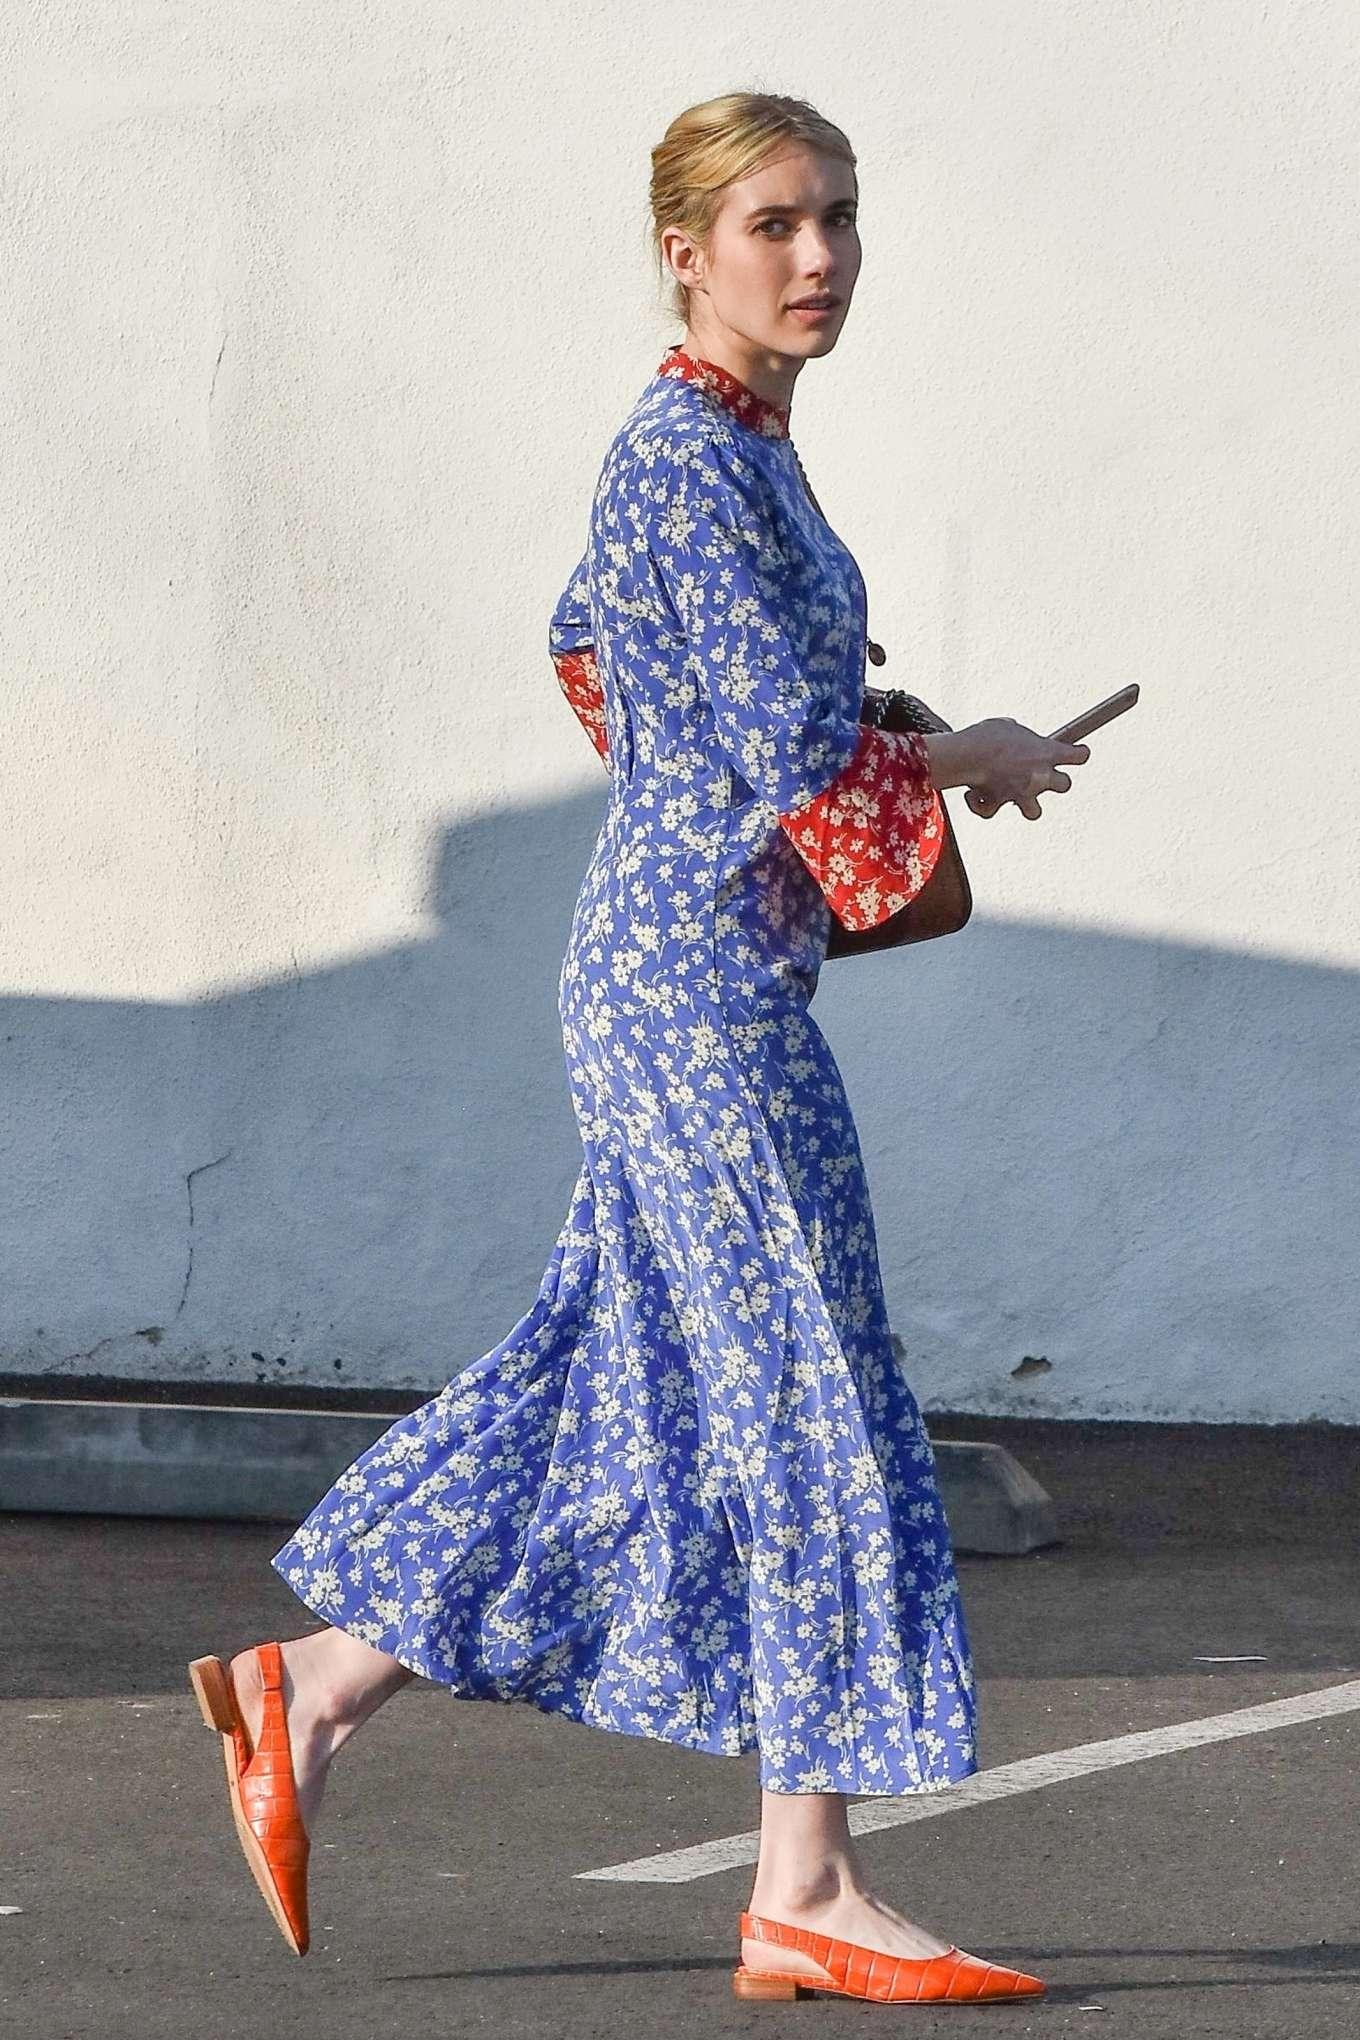 Emma Roberts 2019 : Emma Roberts at Blue Bottle Coffee Shop in Los Feliz-09